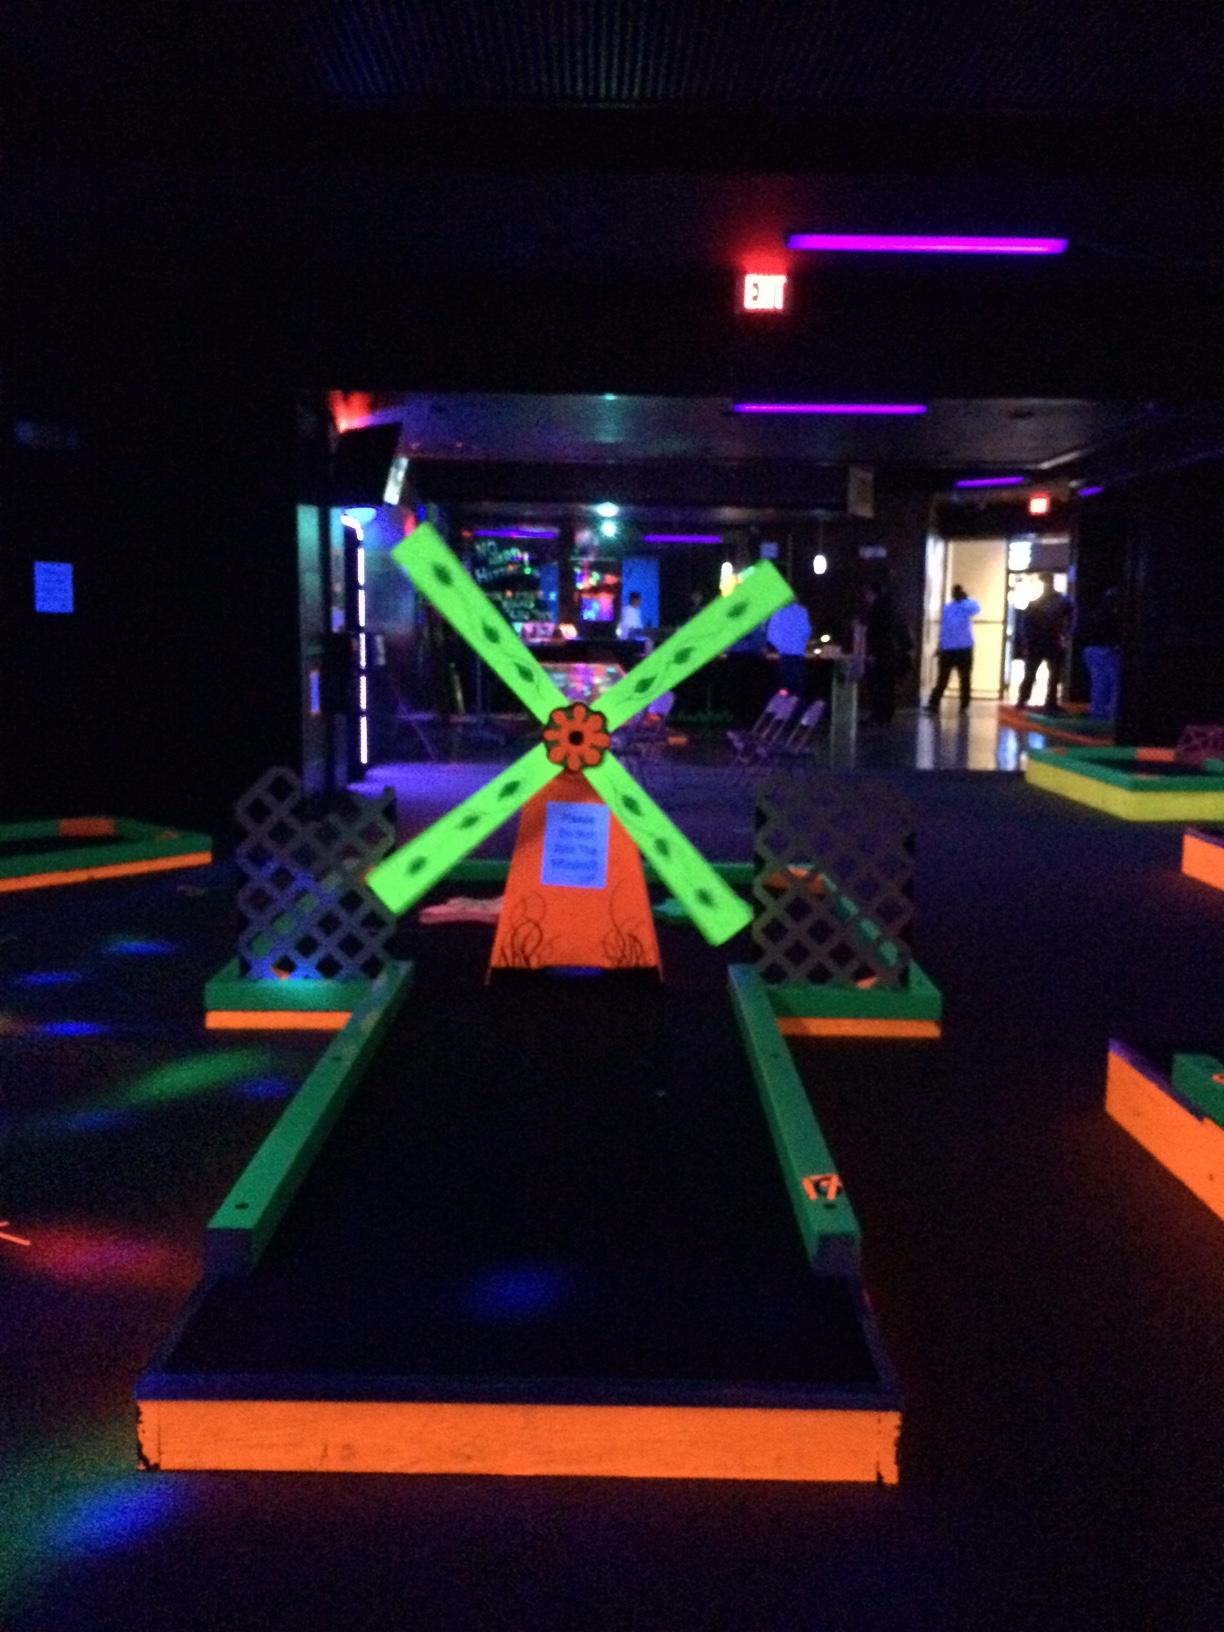 kid fun in indianapolis - Indianapolis Kids Glow Golf